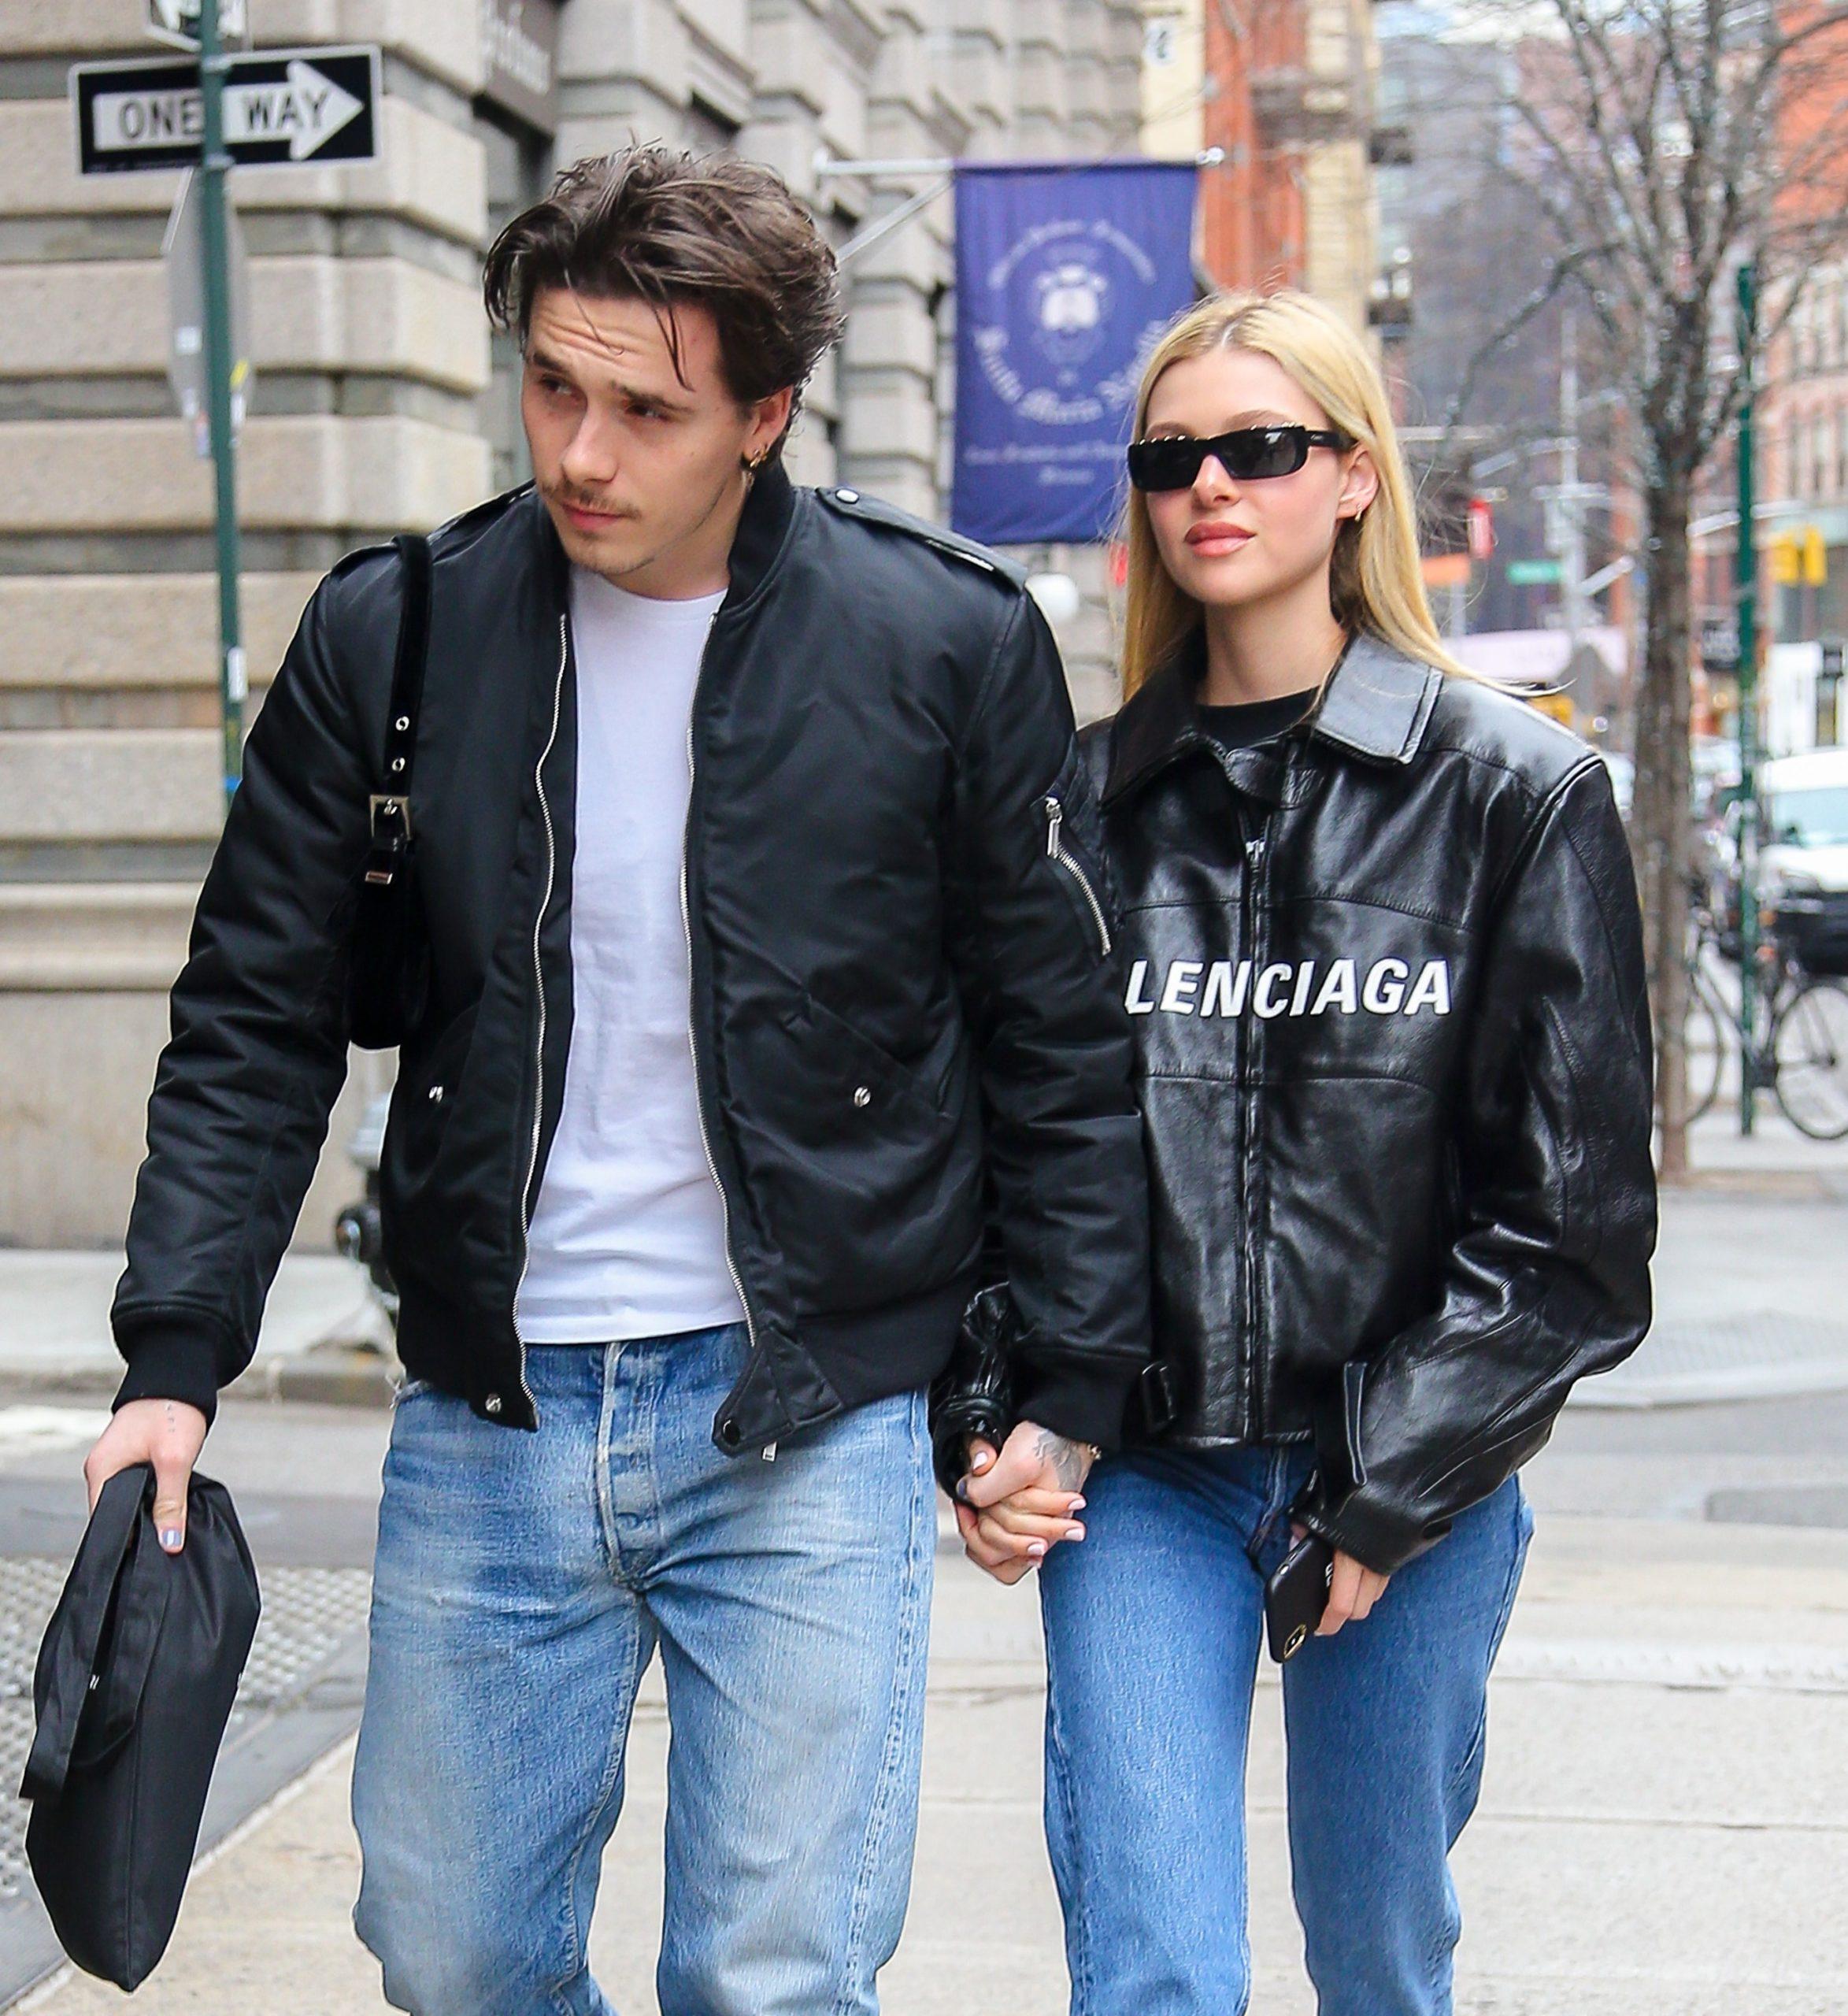 Brooklyn Beckham and Nicola Peltz are engaged